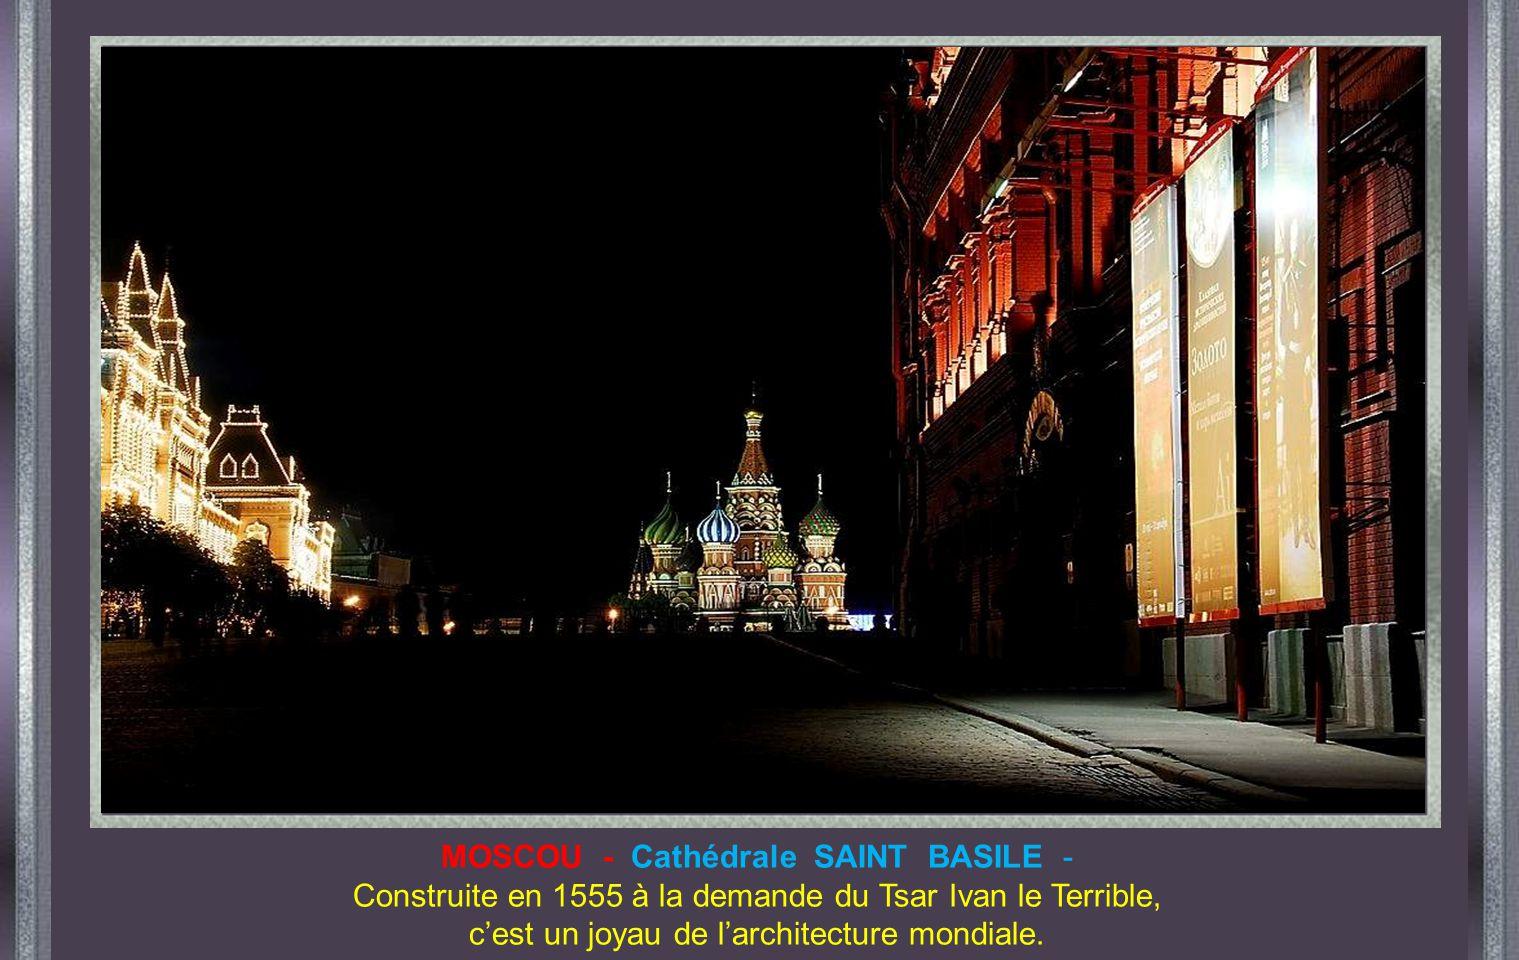 MOSCOU - Cathédrale SAINT BASILE -